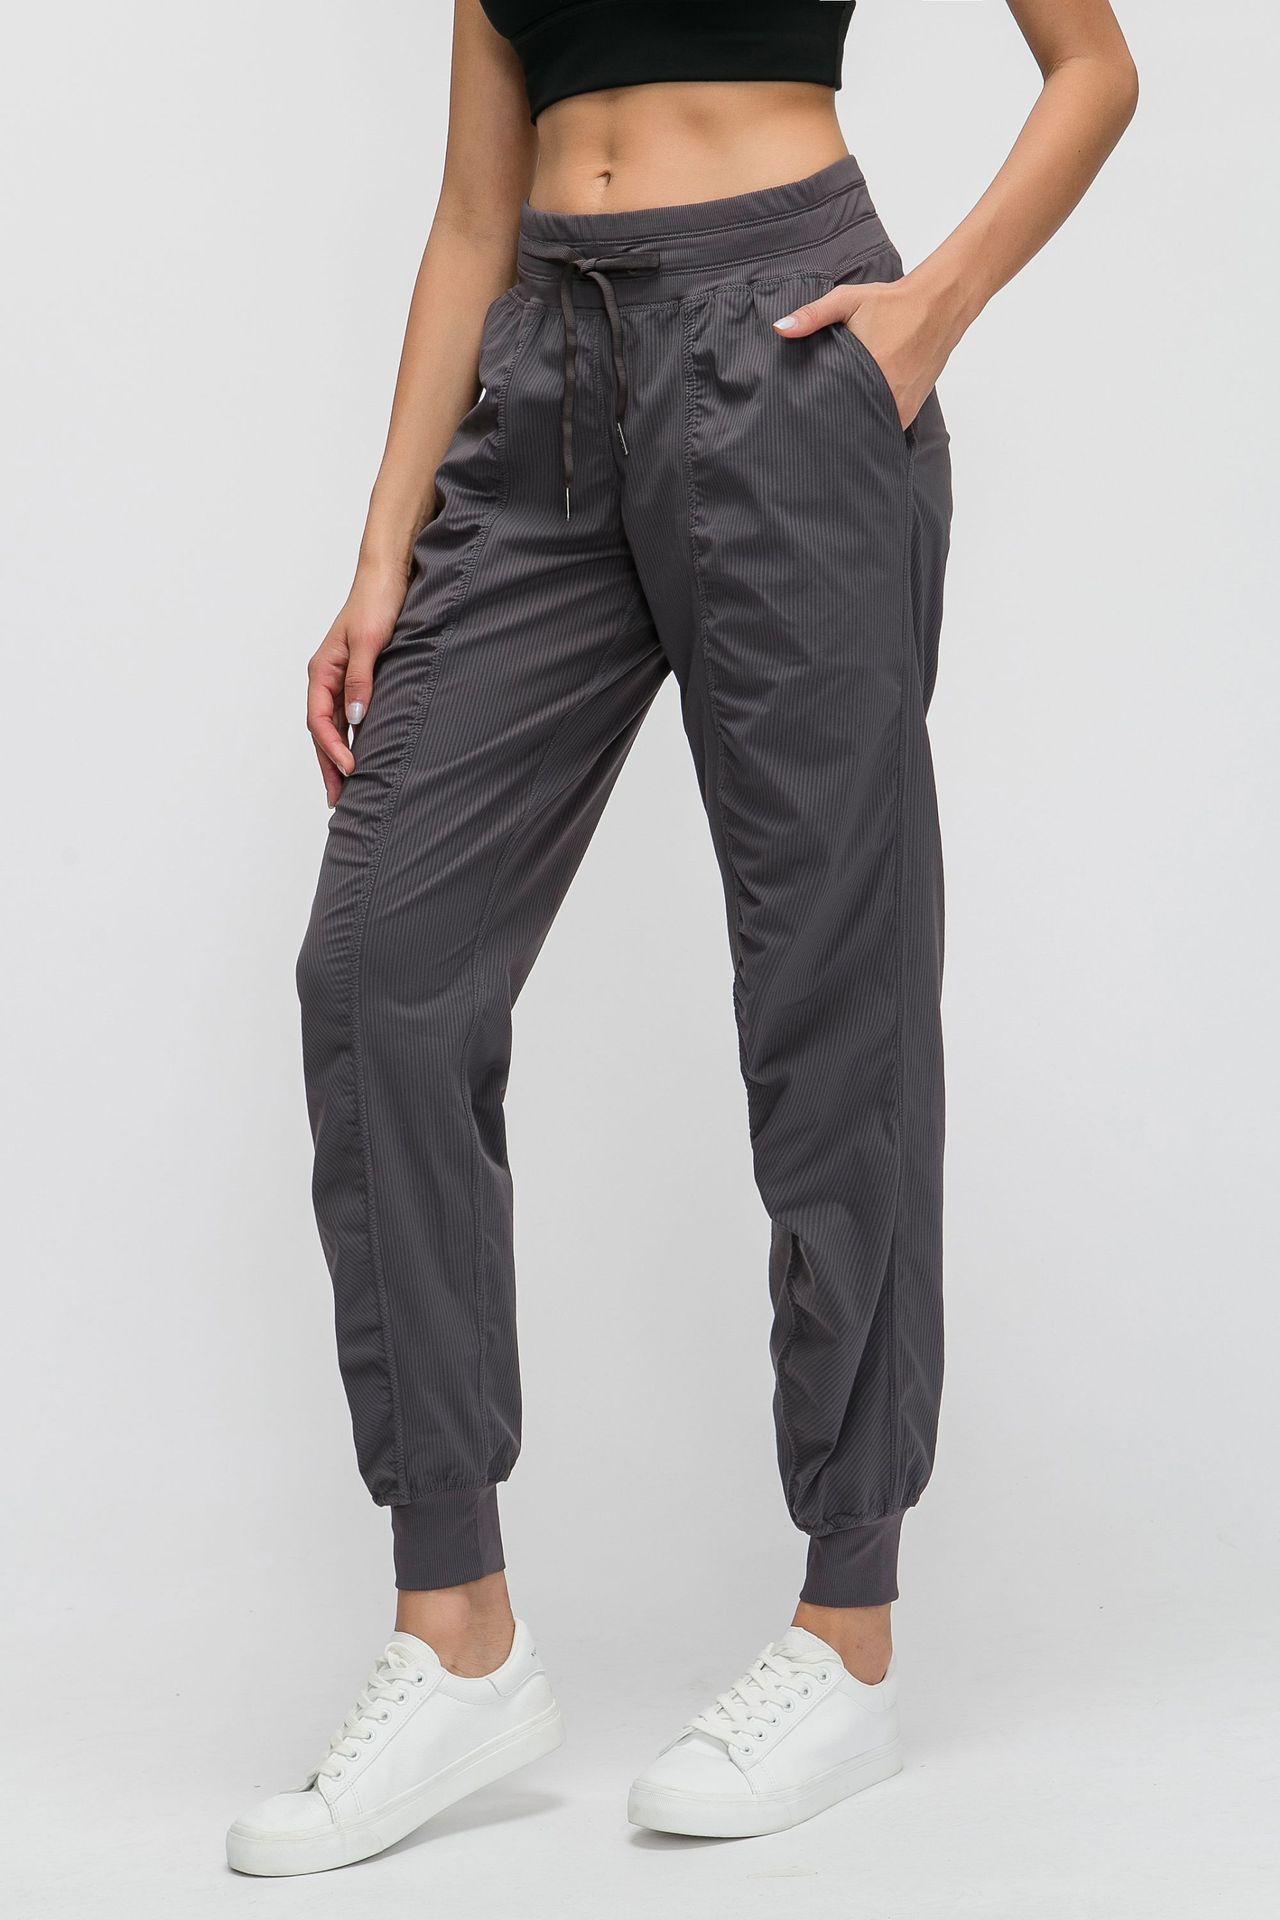 Aqua leggings jogger Mila Comfort-Fit Drawstring Sport Pants